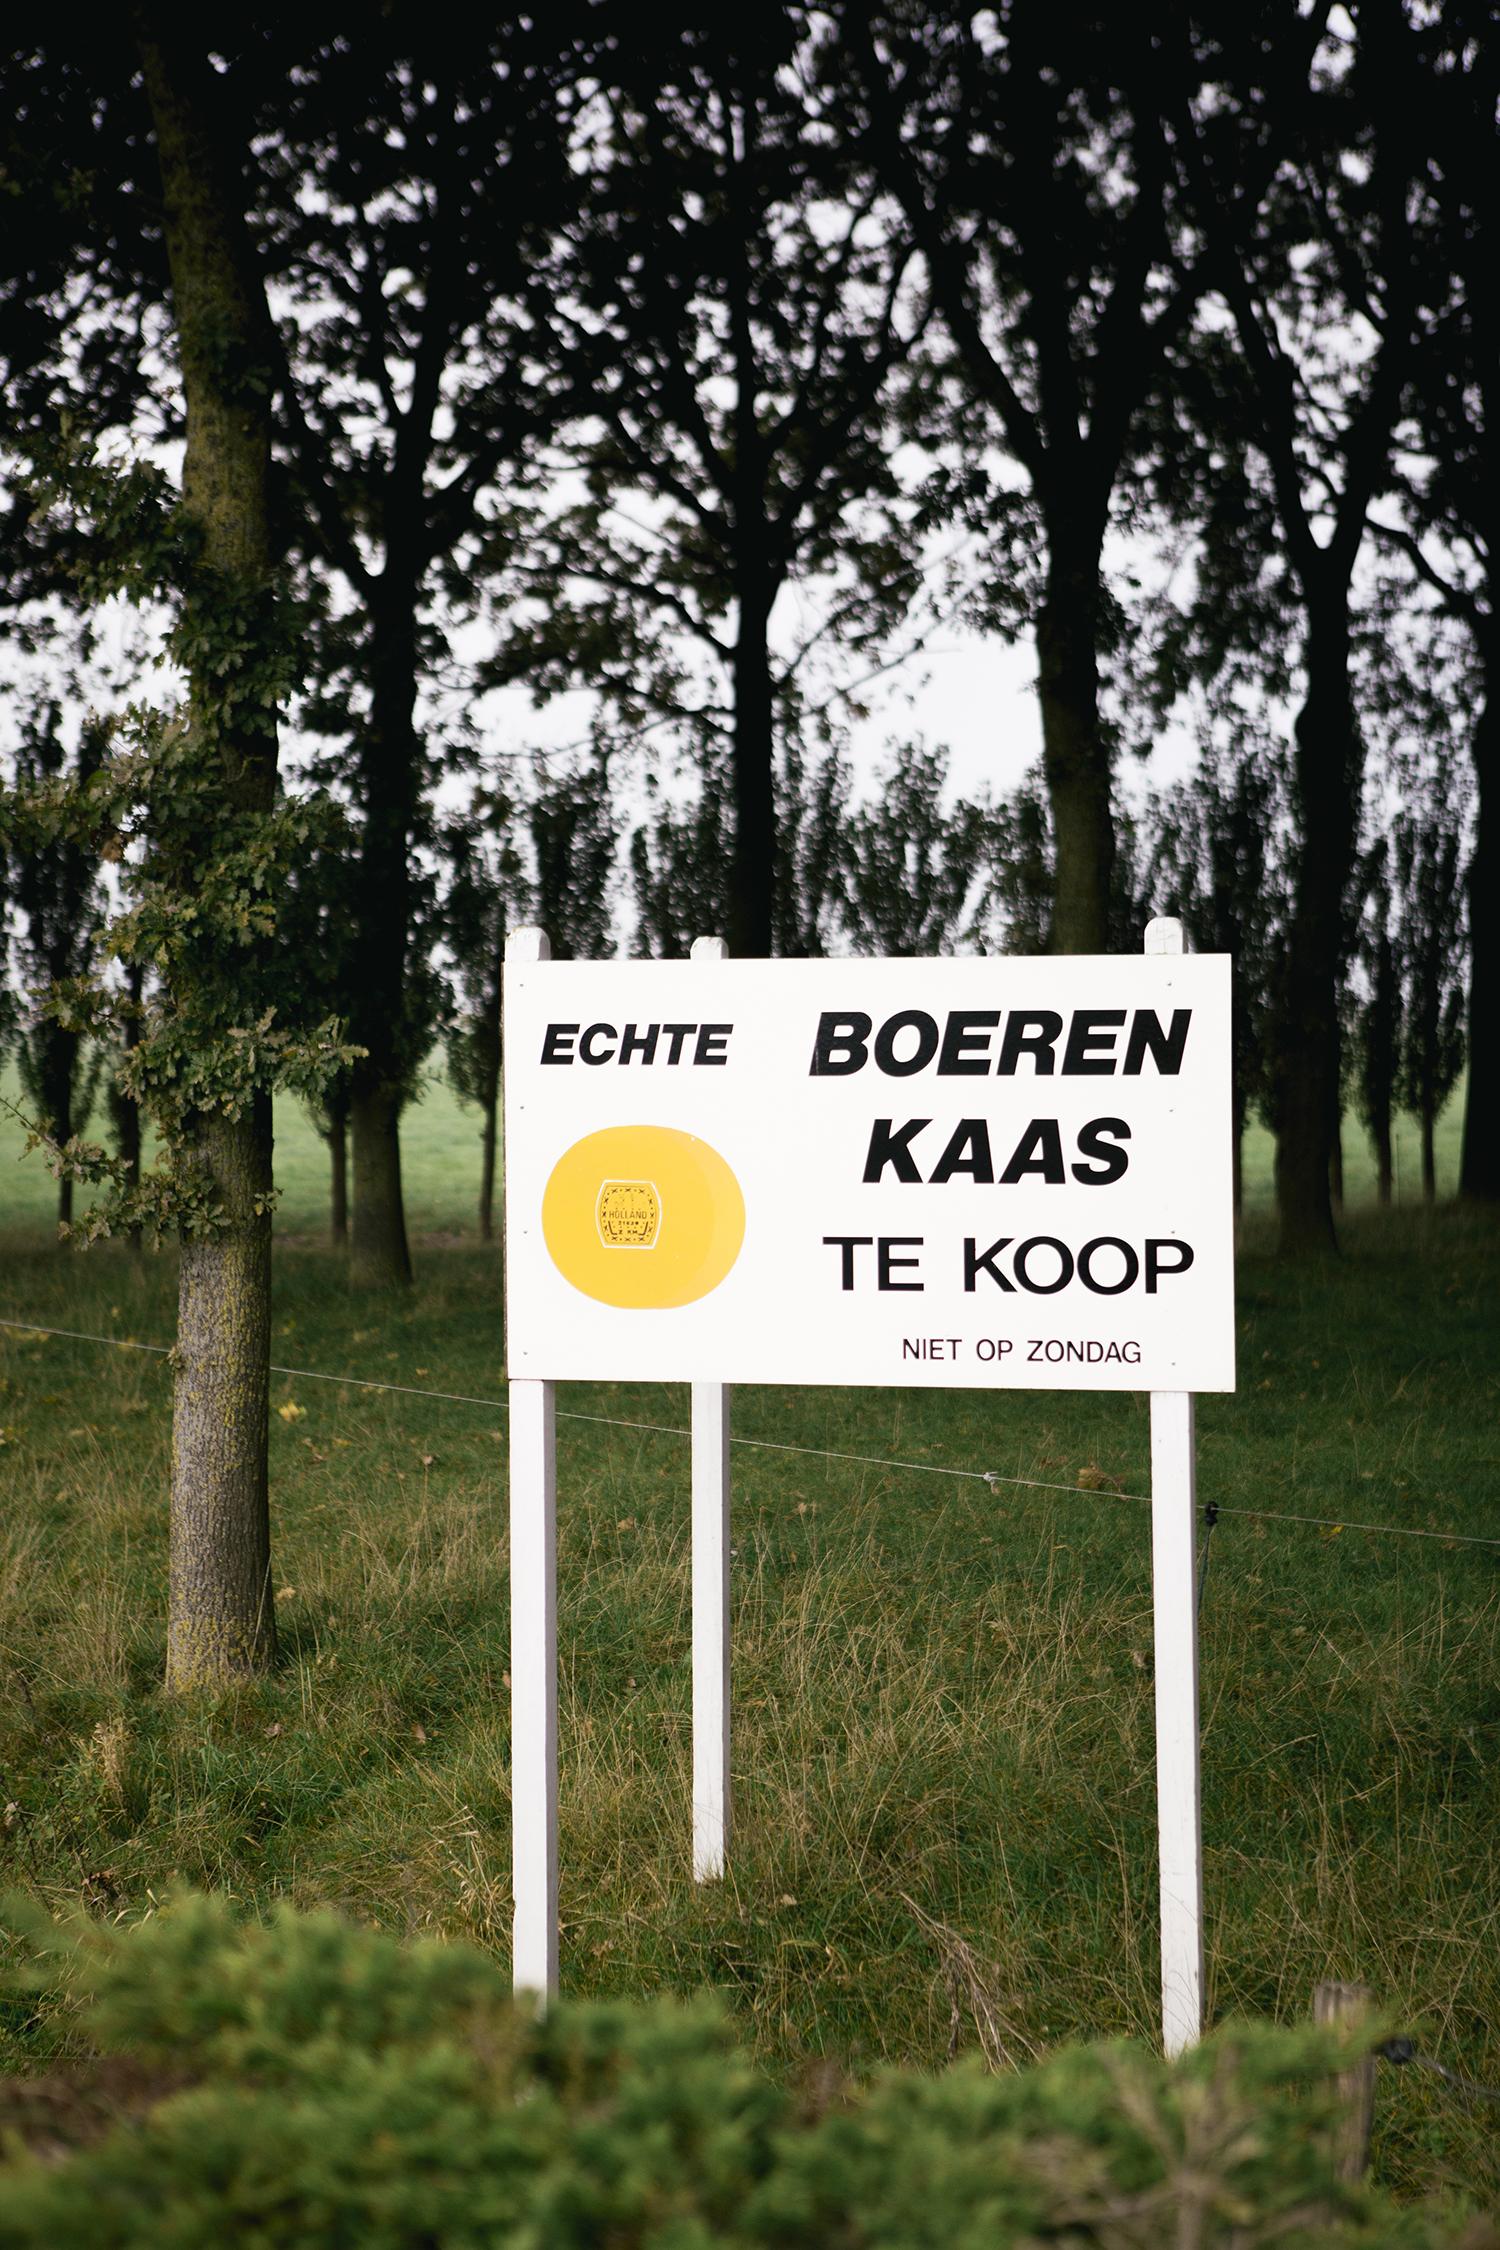 DesirévandenBerg_Kaasboek_Verwey__87A5980.jpg